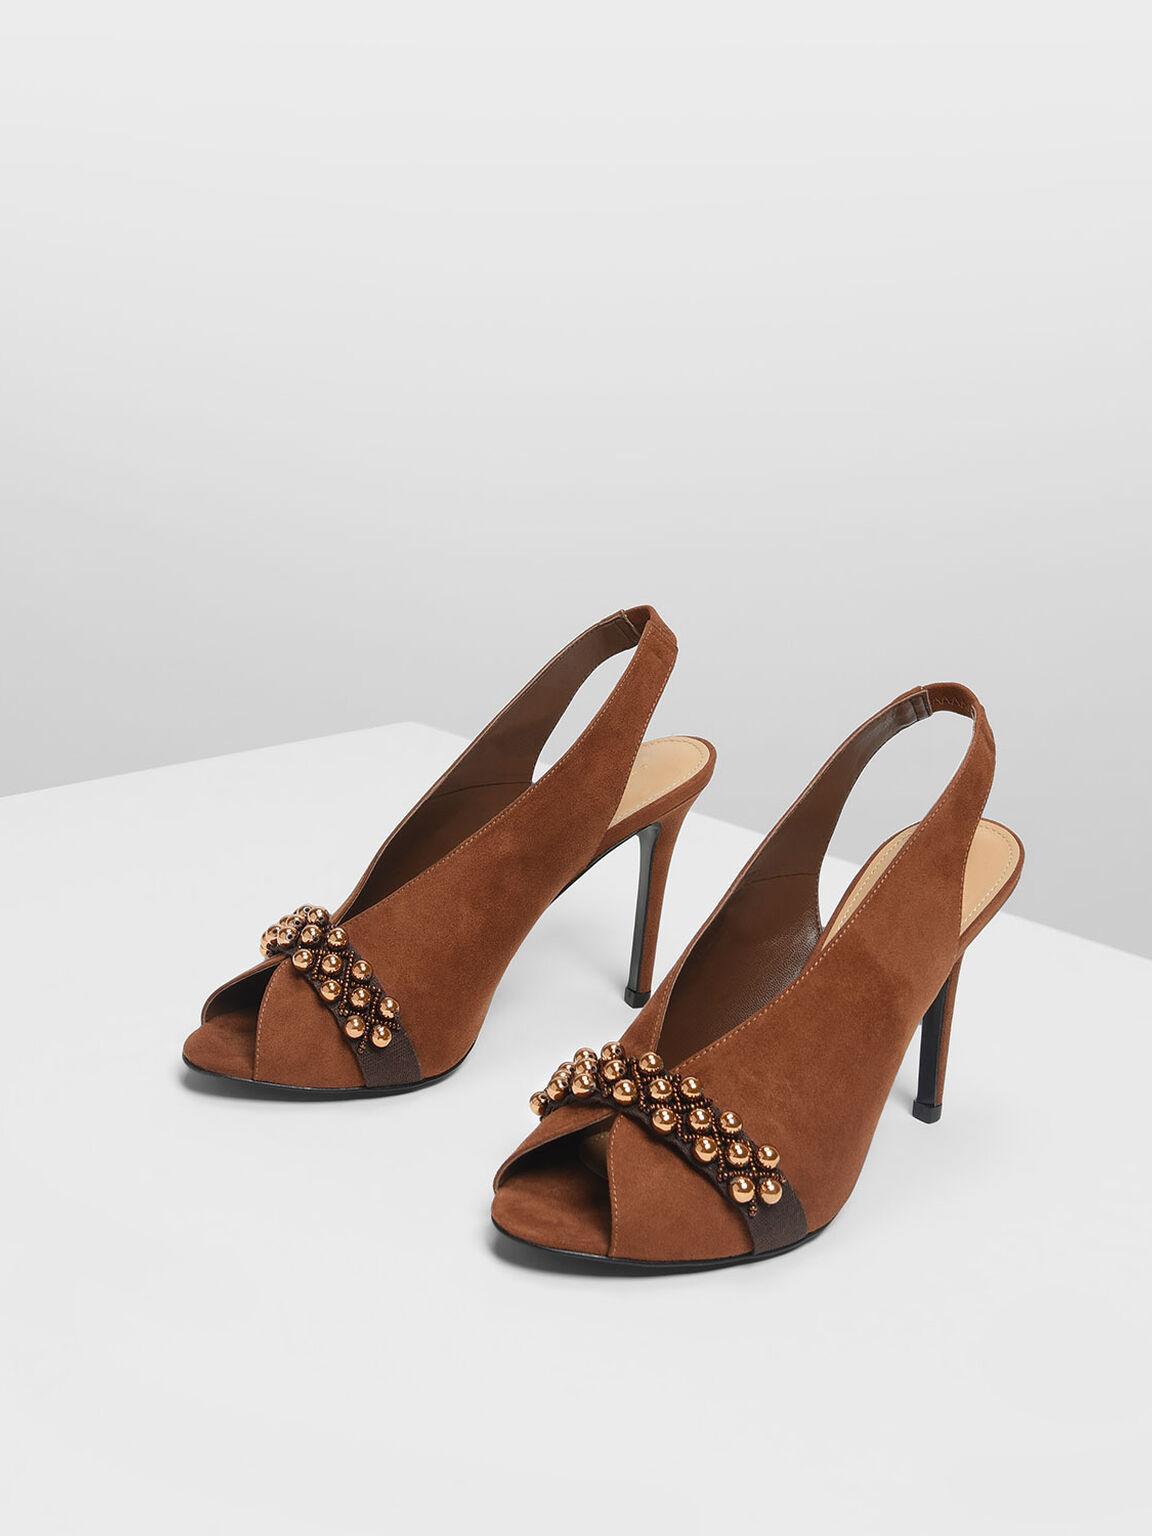 Embellished Peep Toe Slingbacks, Brown, hi-res